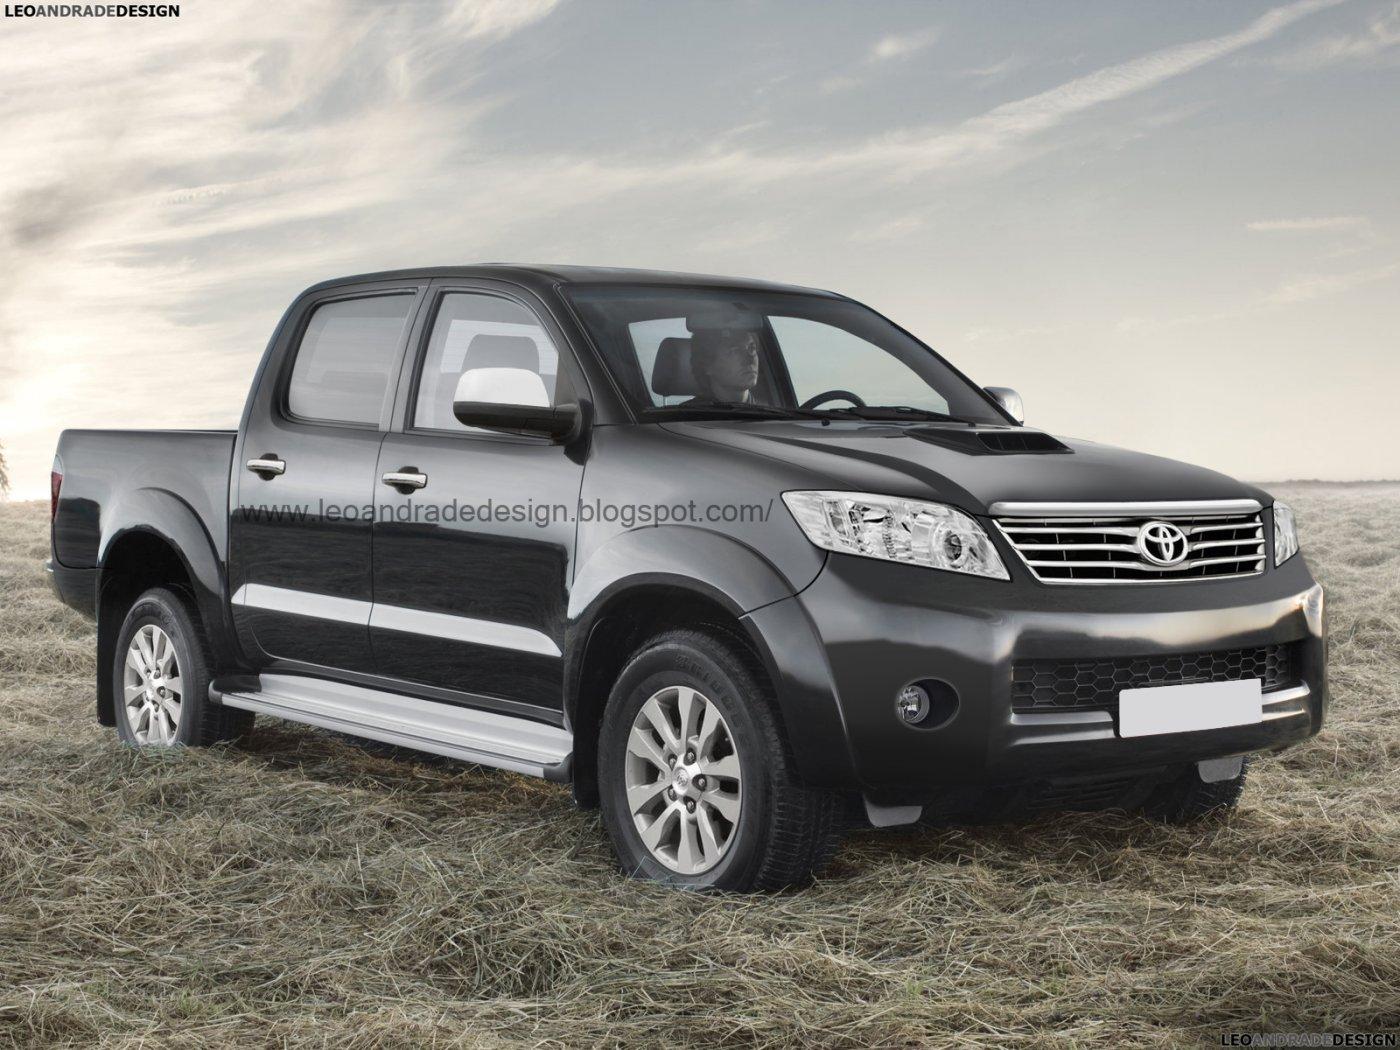 Nissan Navara Vs Toyota Hilux